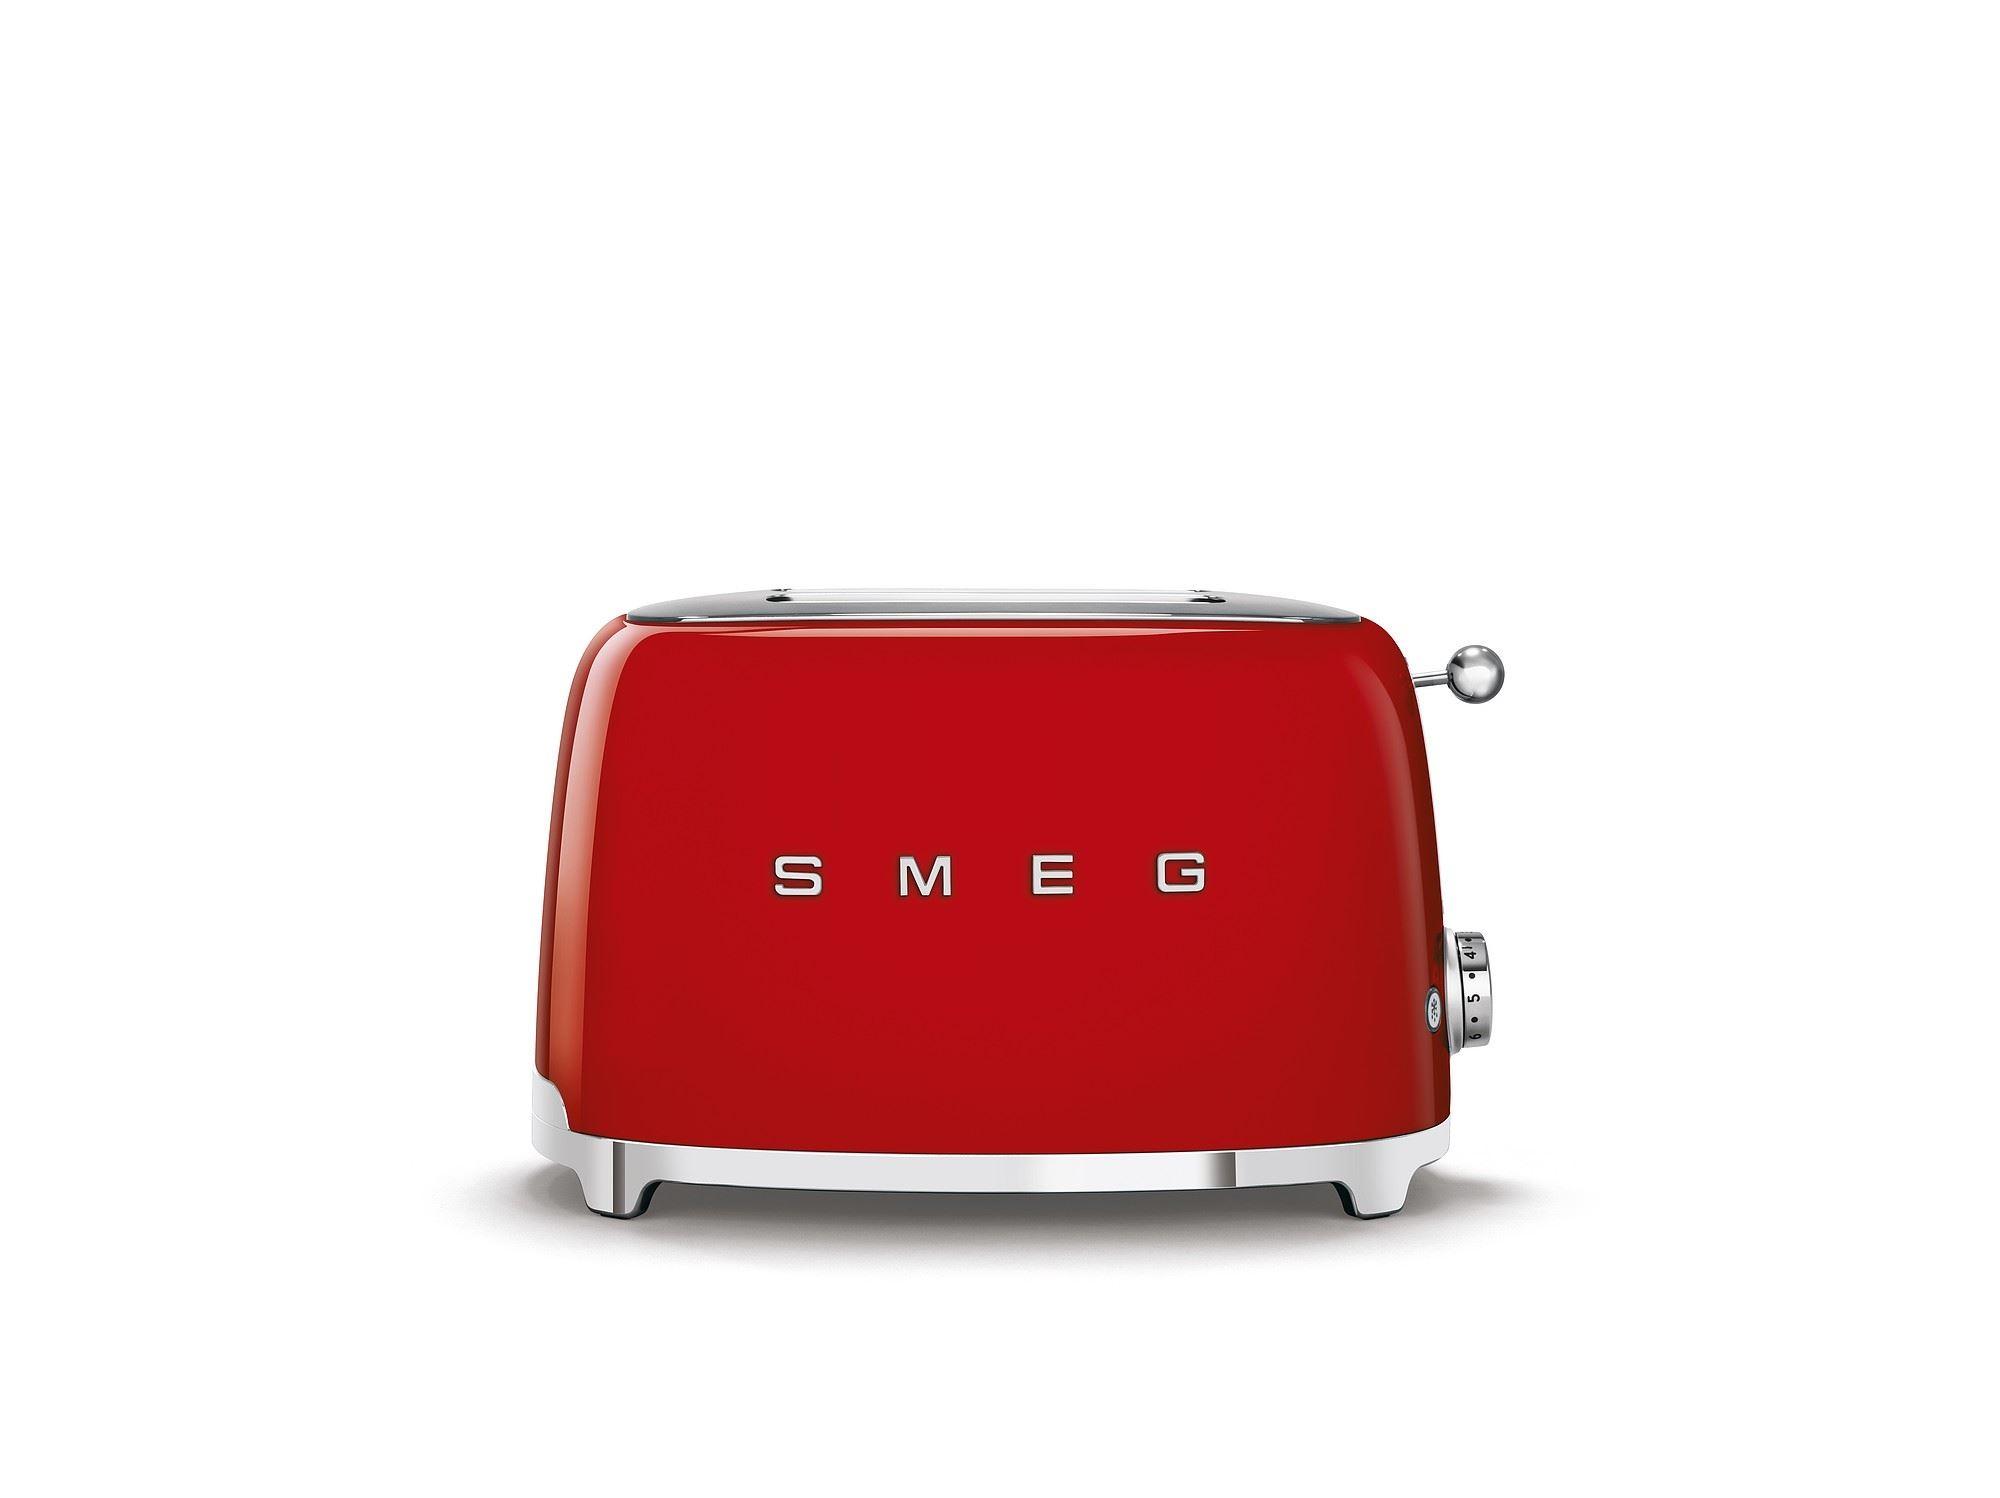 SMEG Toaster 2-Schlitz kompakt 50's Style